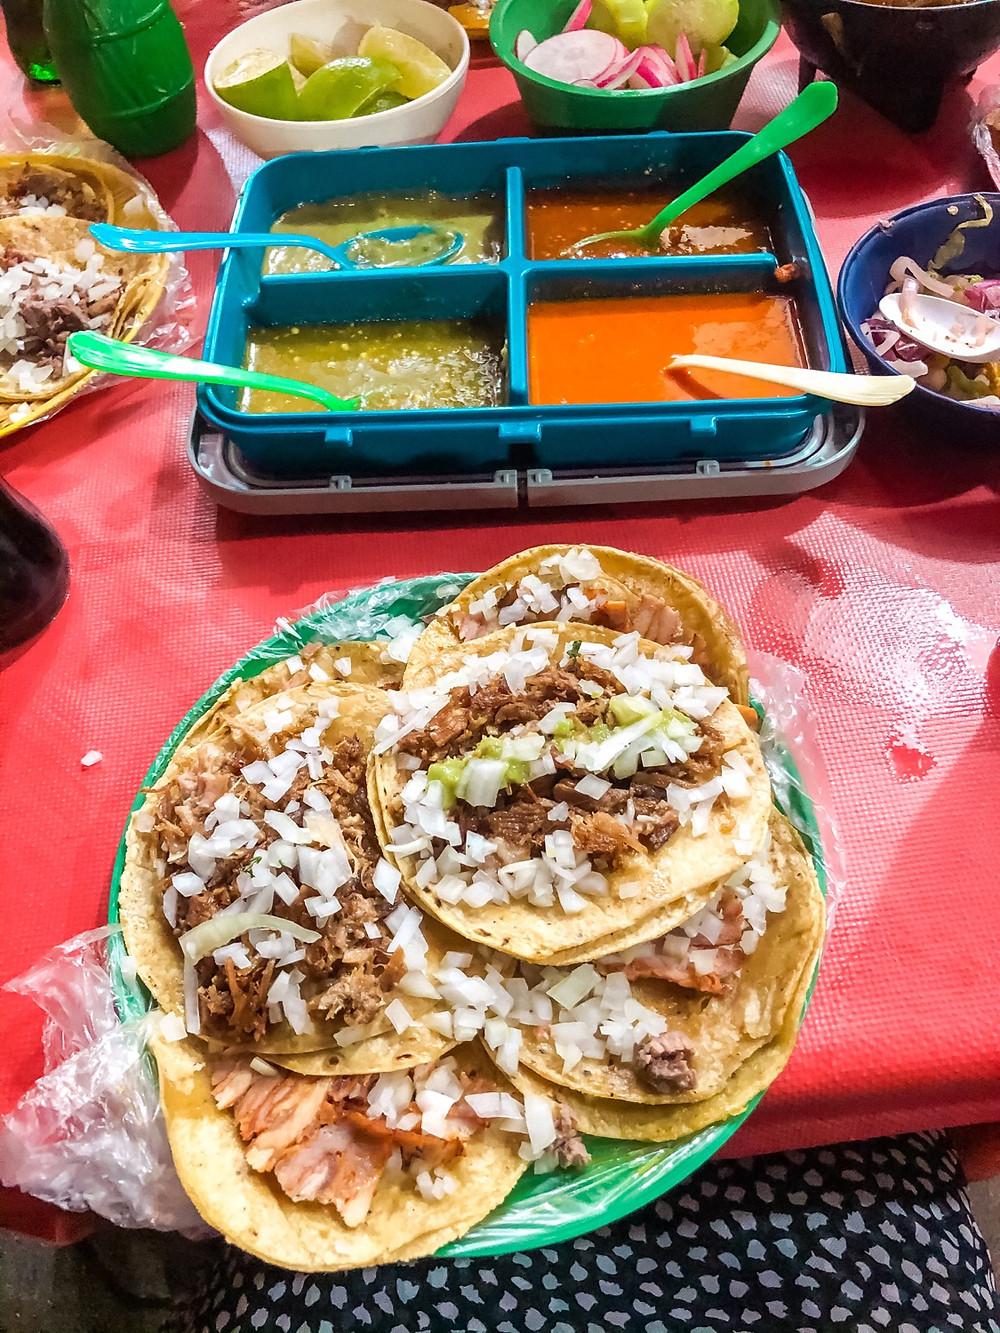 Tulum-restaurant-tipps-empfehlungen-taco-el-nero